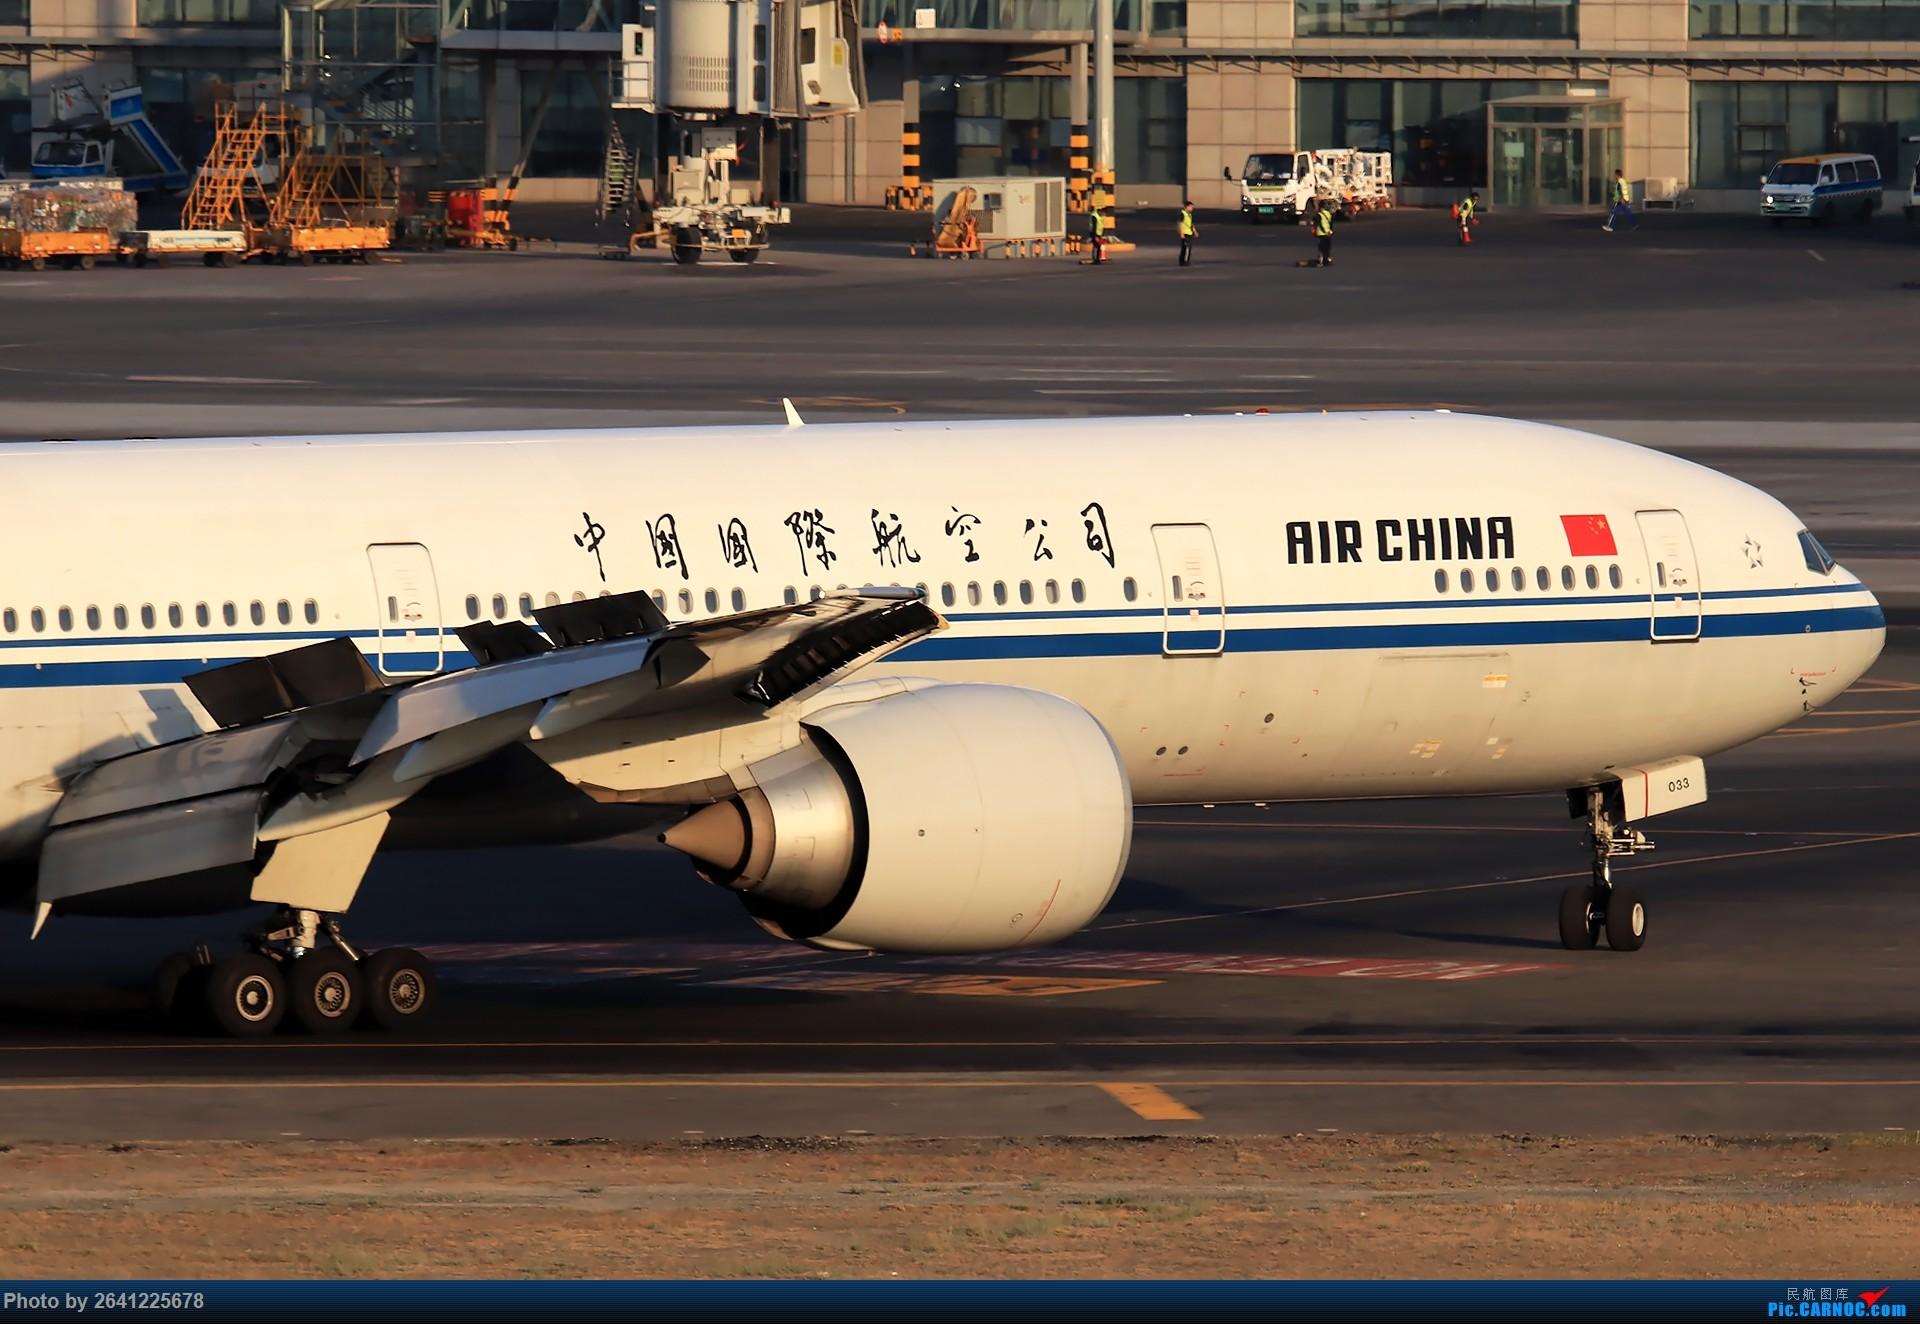 Re:[原创]【小周游记第7集拍机贴】乌鲁木齐绝美的地景和光线 BOEING 777-300ER B-2033 中国乌鲁木齐地窝堡国际机场